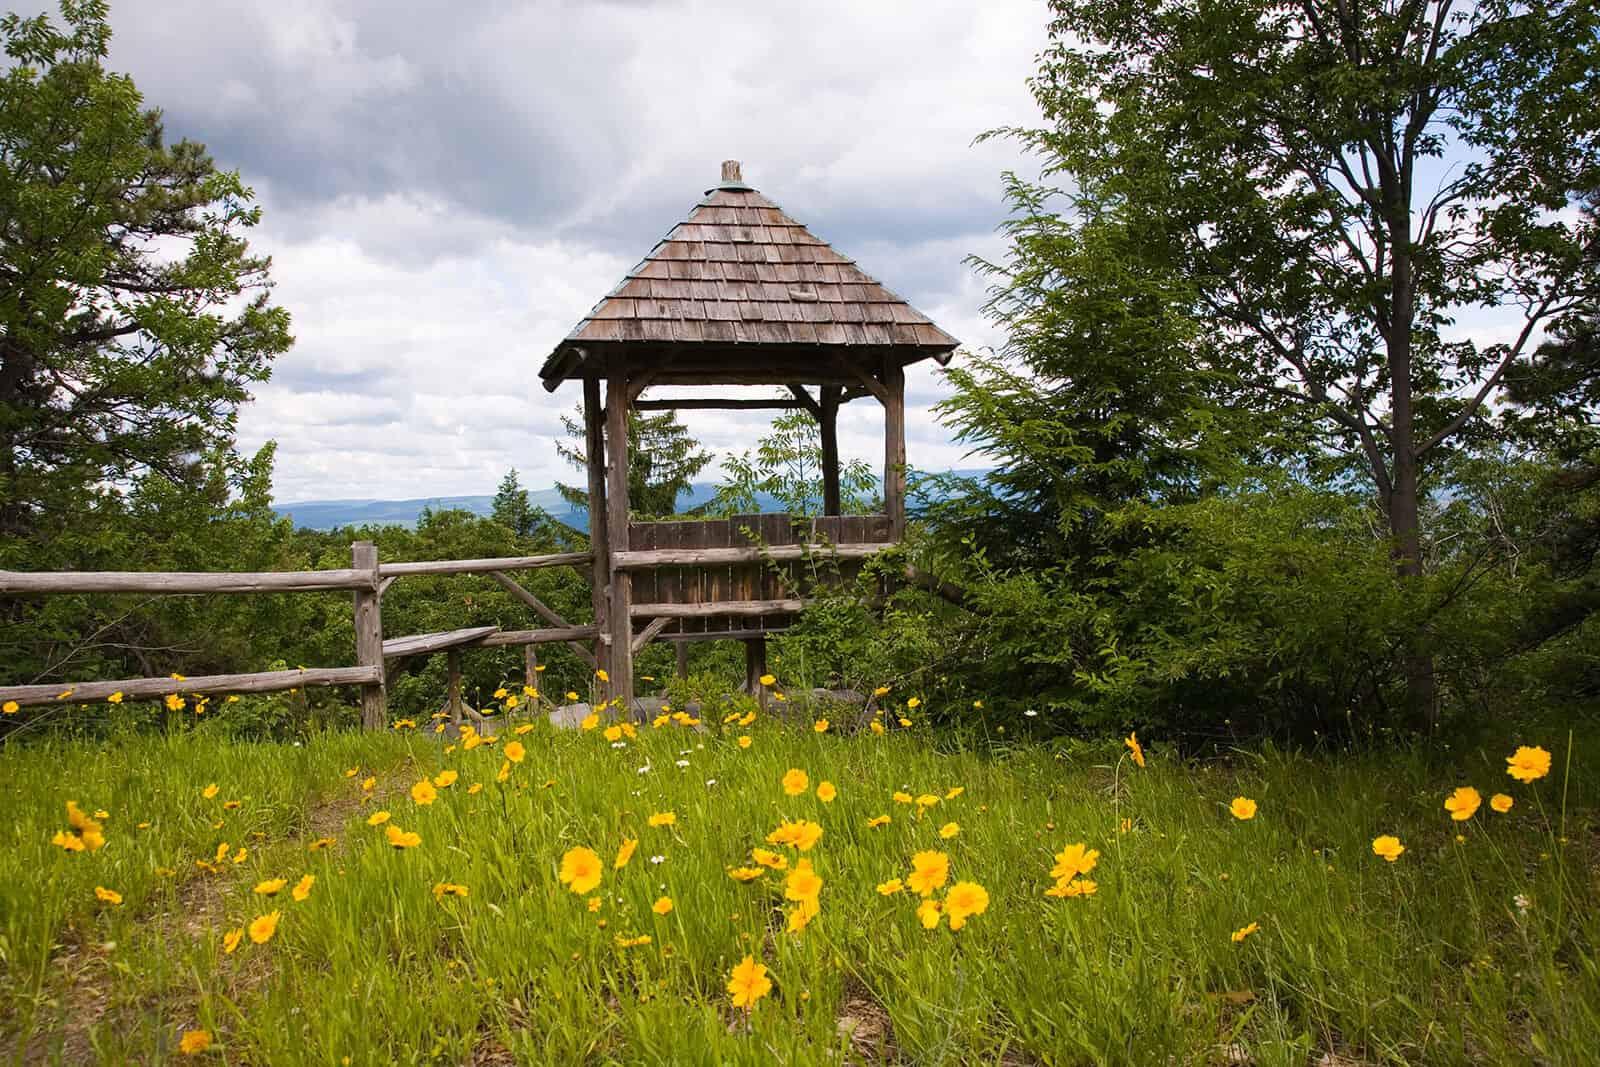 Mountain House - Mohonk - Hudson Valley Resort